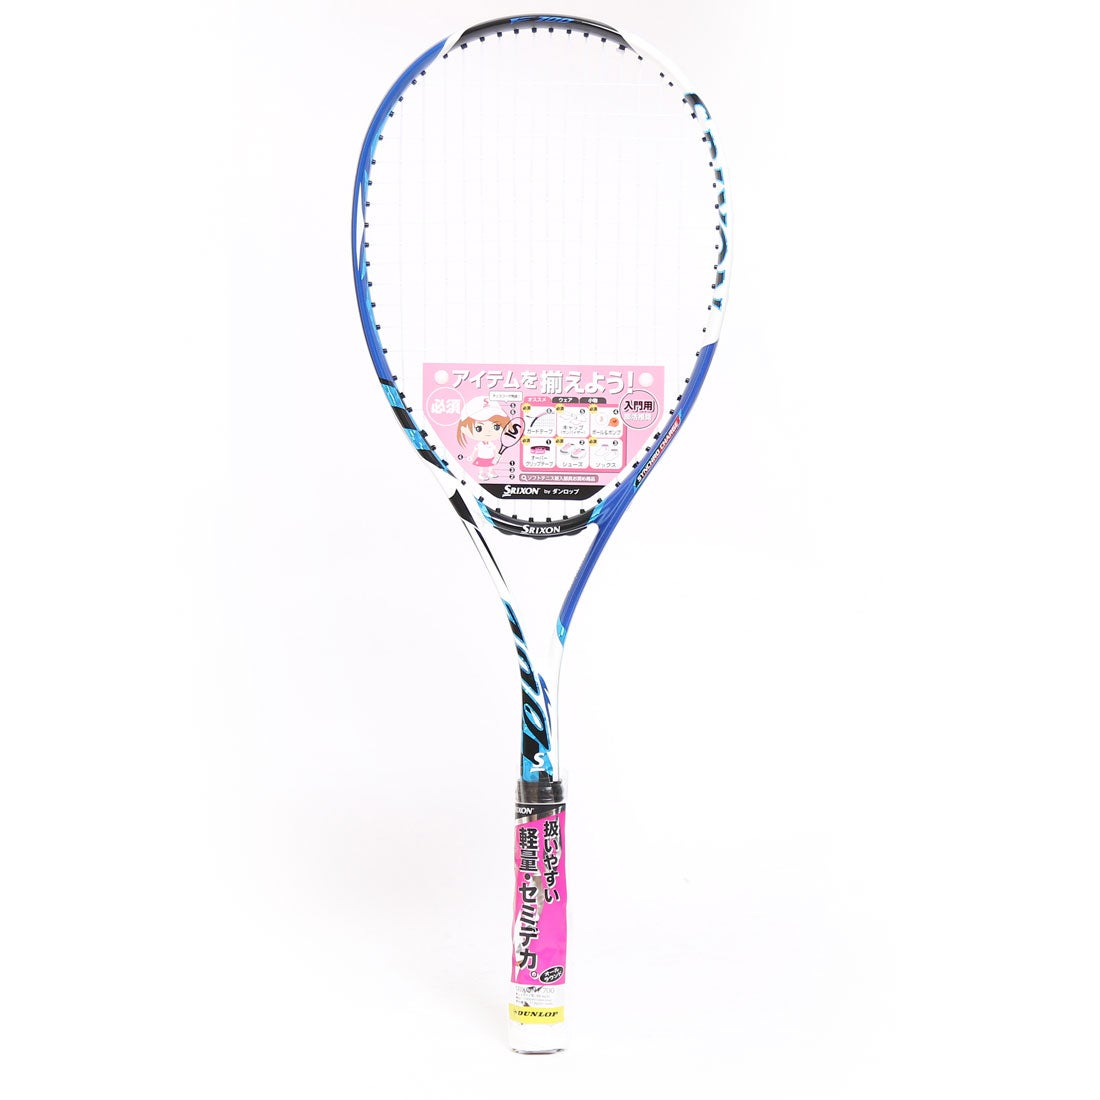 4d297cd7644c09 DUNLOP ダンロップ Dunlop 軟式テニスラケット SRIXON スリクソン ガット張り上げ済み F700 SR11503 ブルー  -レディースファッション通販 ロコンドガールズ ...